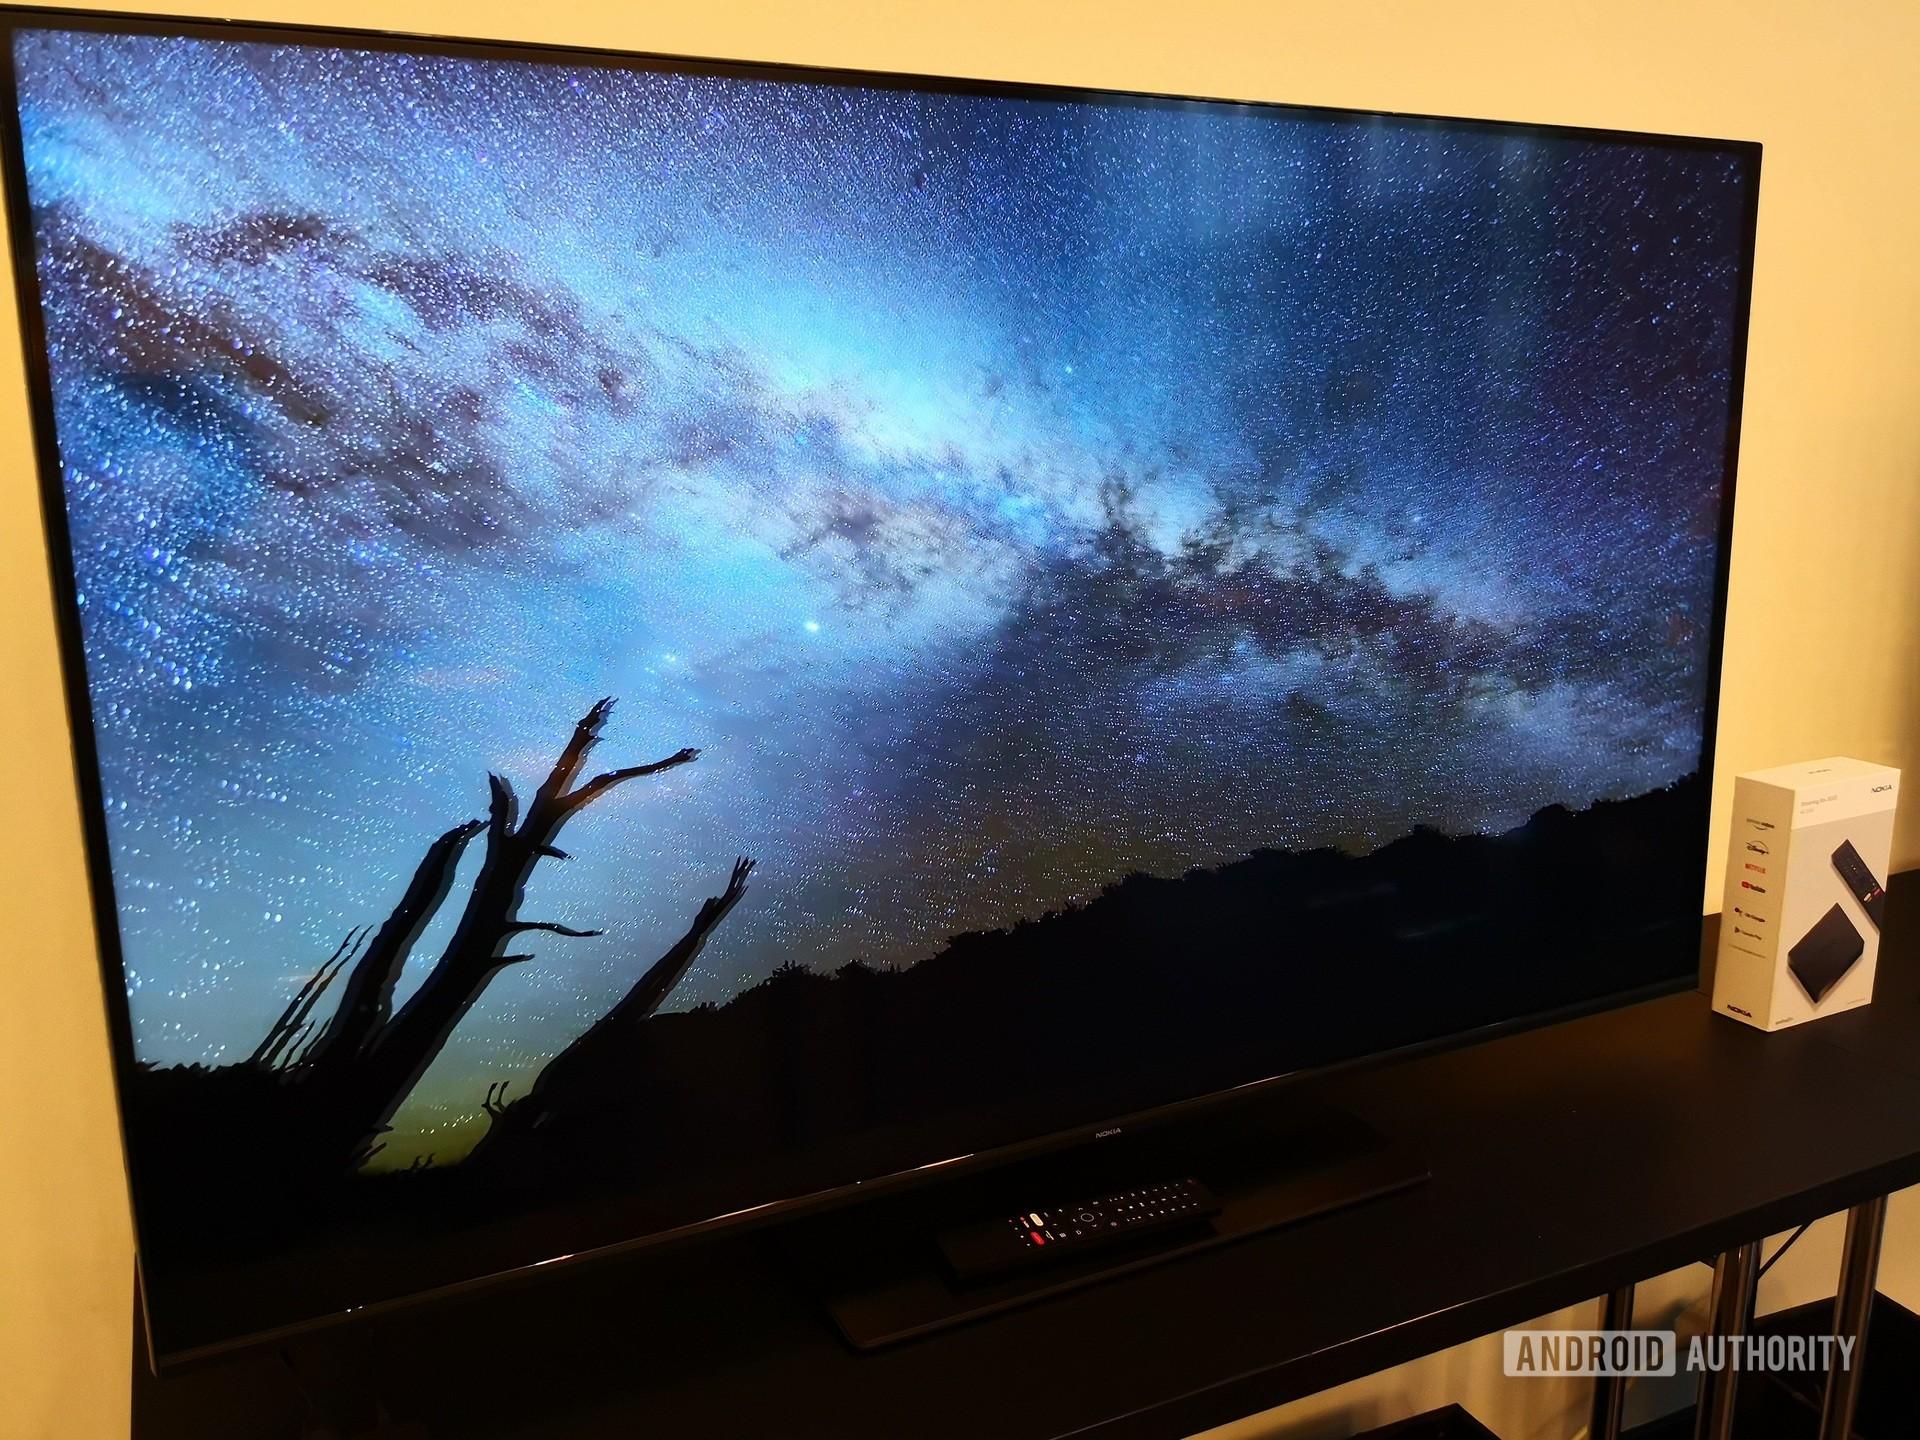 nokia tv and streaming box 1